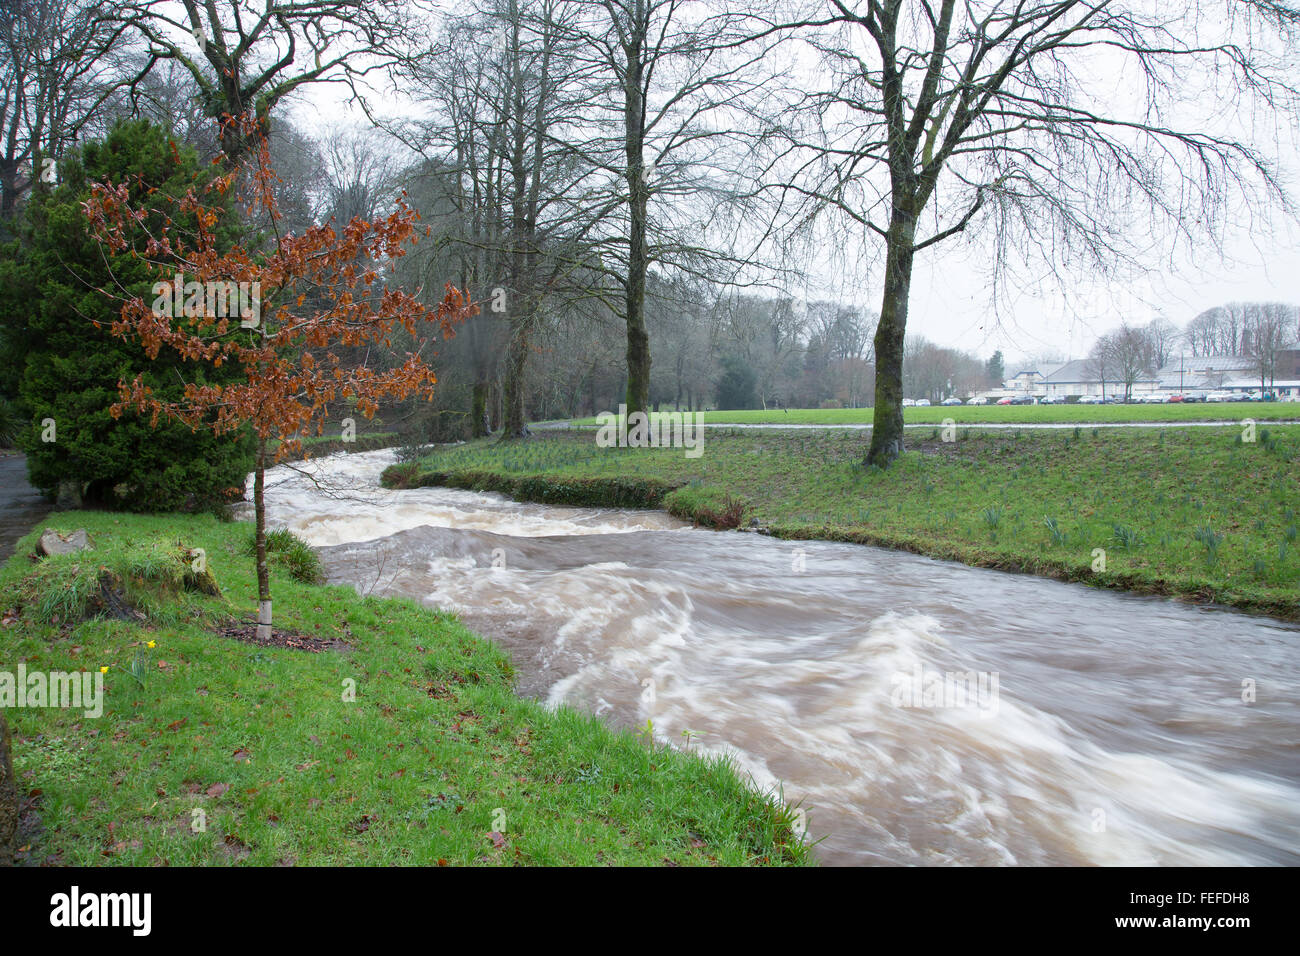 Okehampton, Devon, UK. 6th February, 2016. High river levels at Simmons Park in Okehampton during storm. Credit: - Stock Image